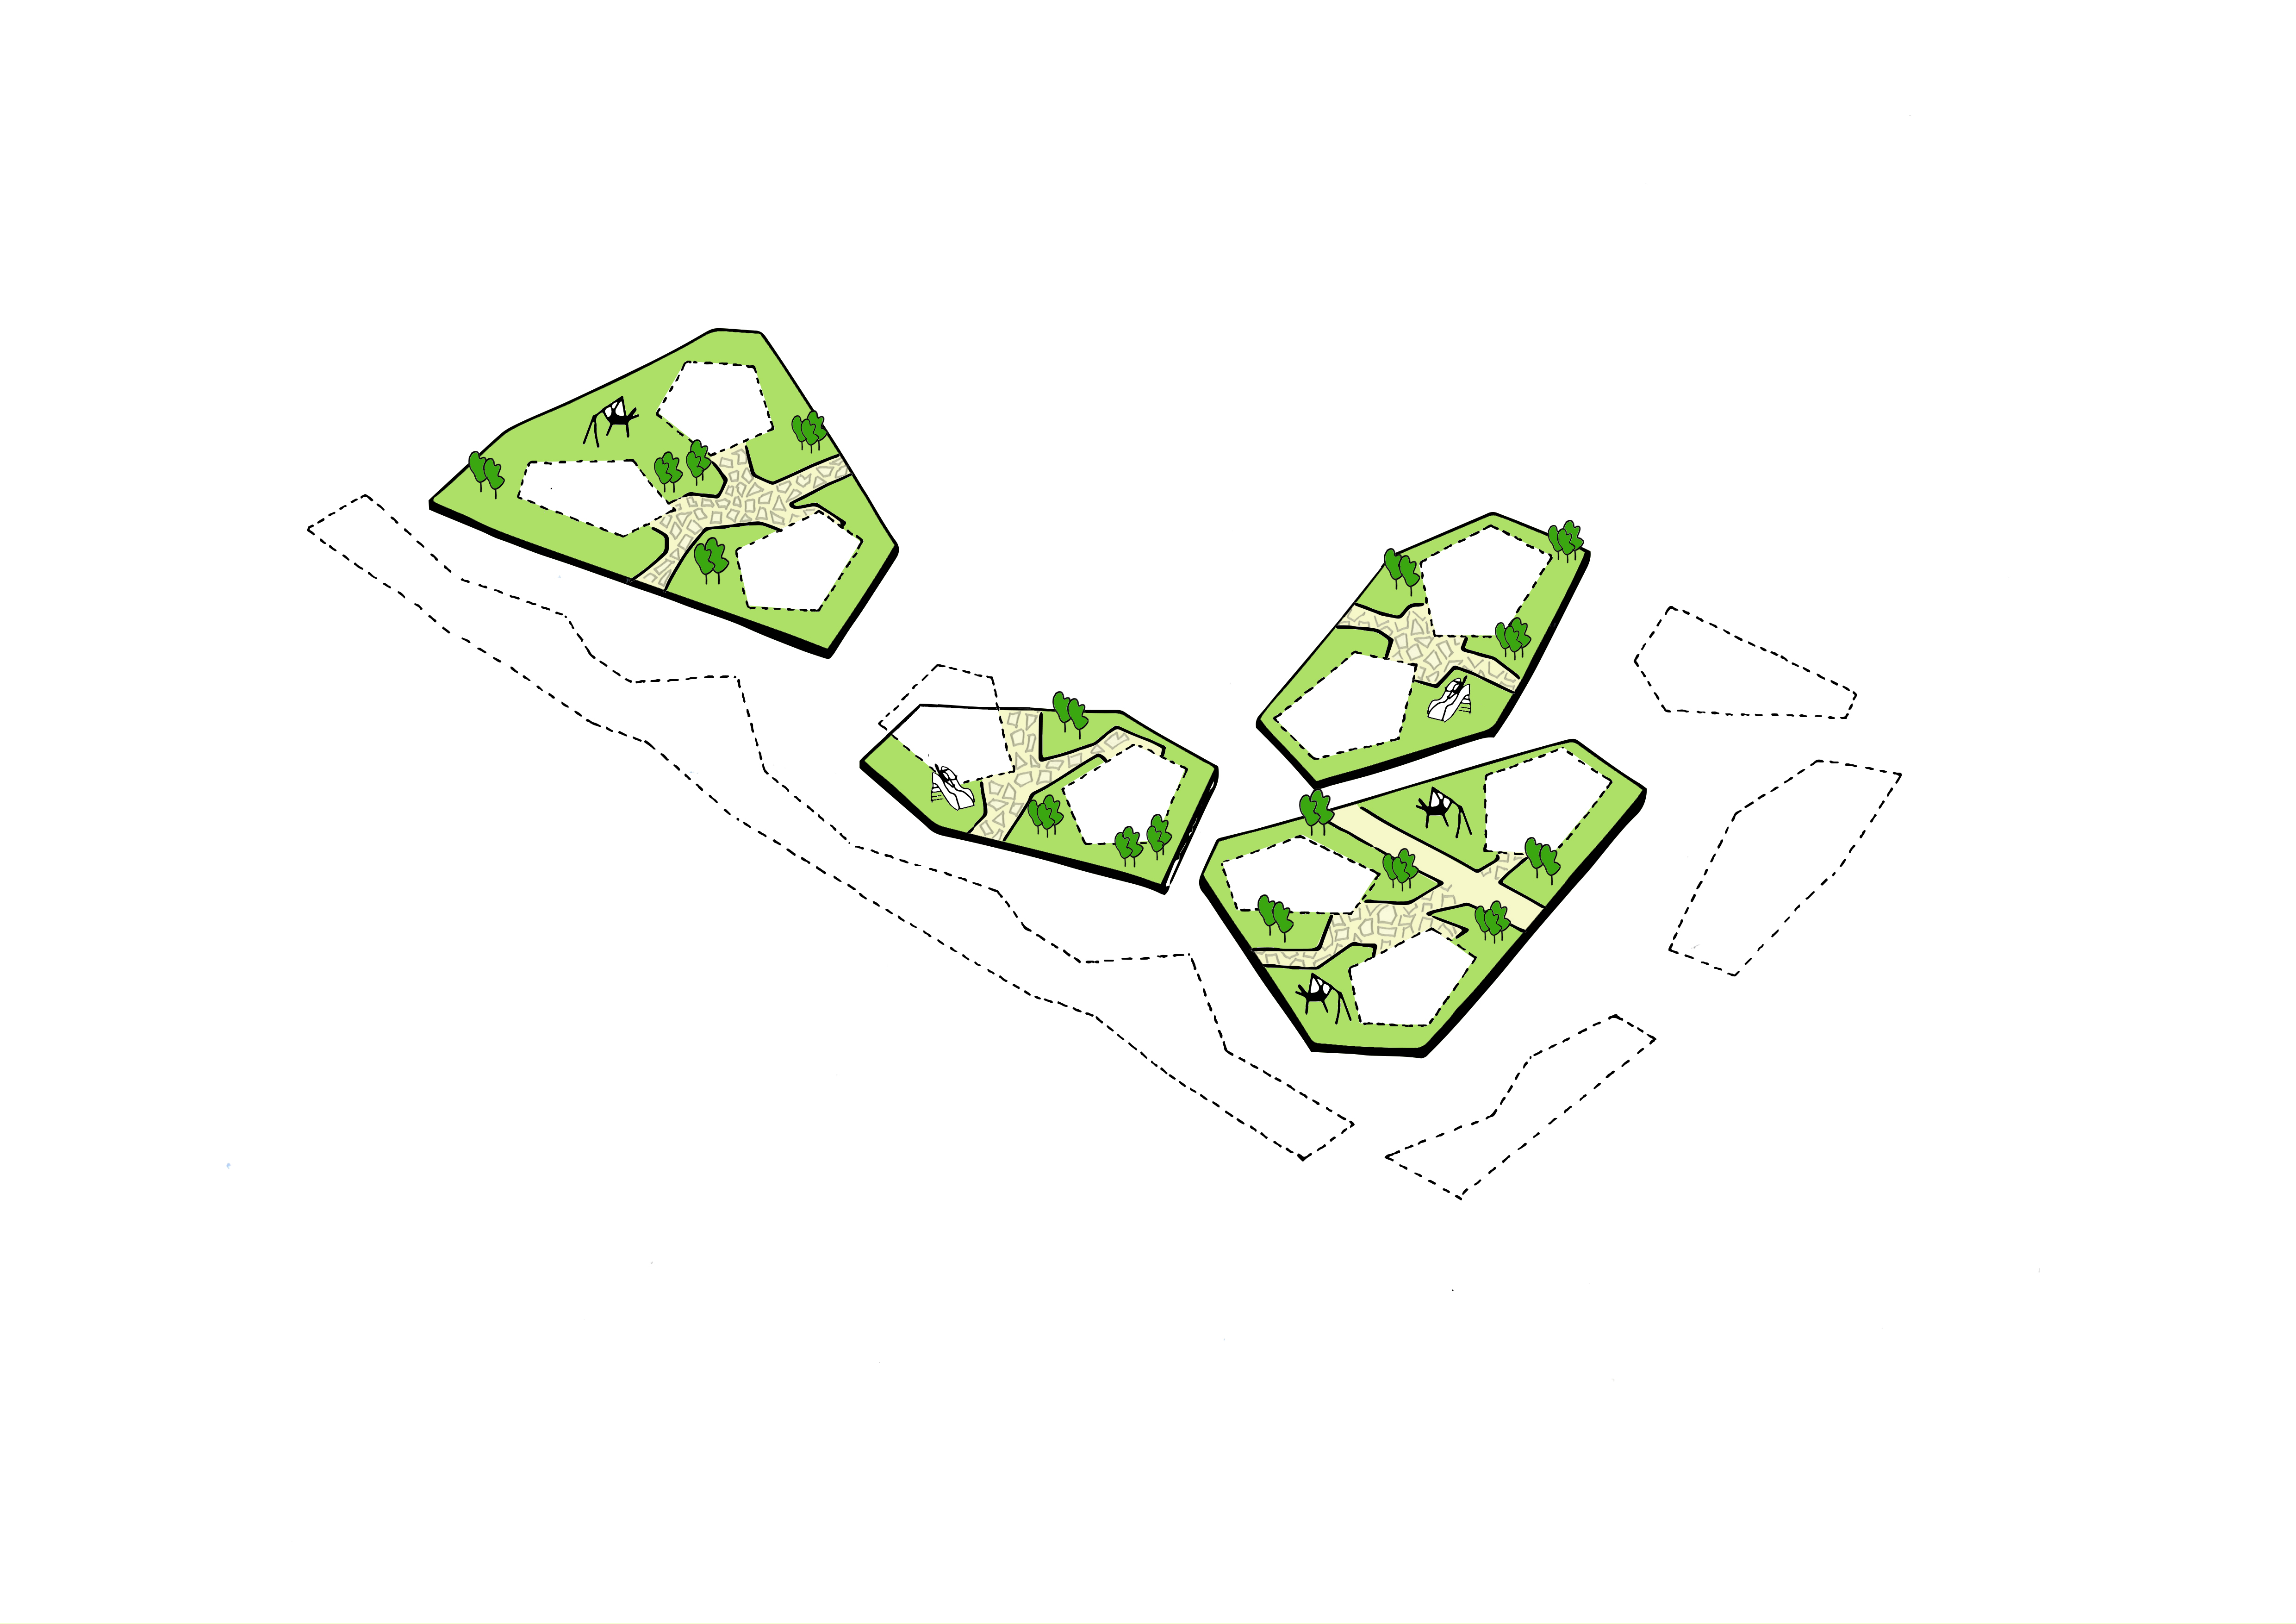 felixx-ludlstrasse-conceptclusters.jpg